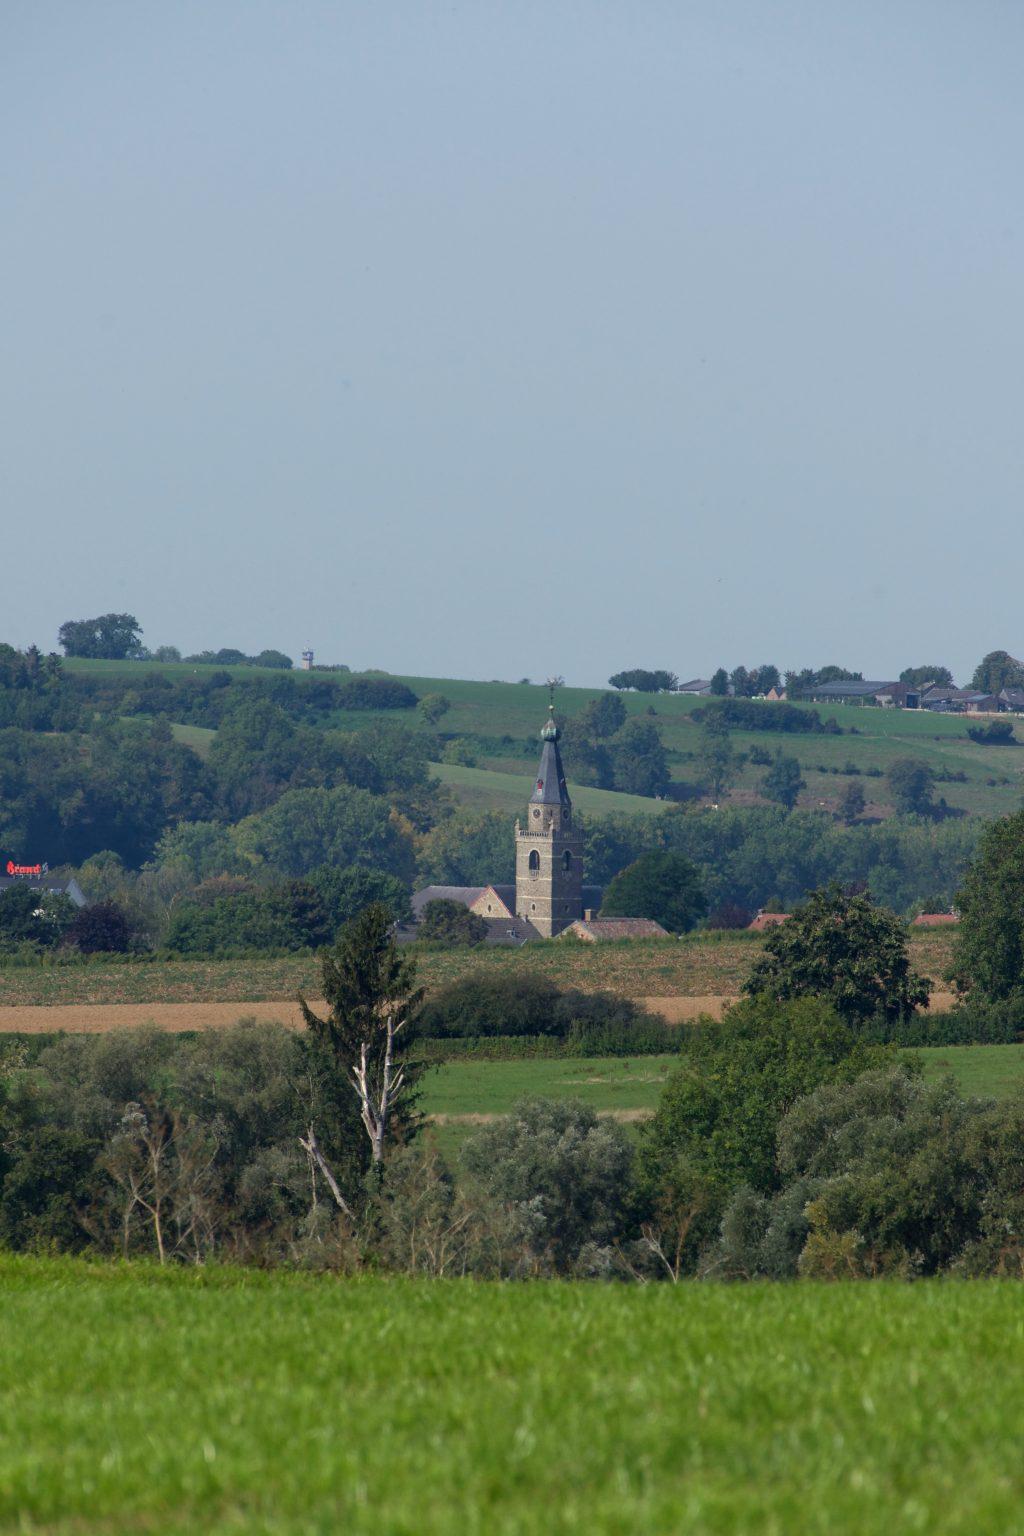 Mergellandroute: de perfecte roadtrip door Zuid-Limburg